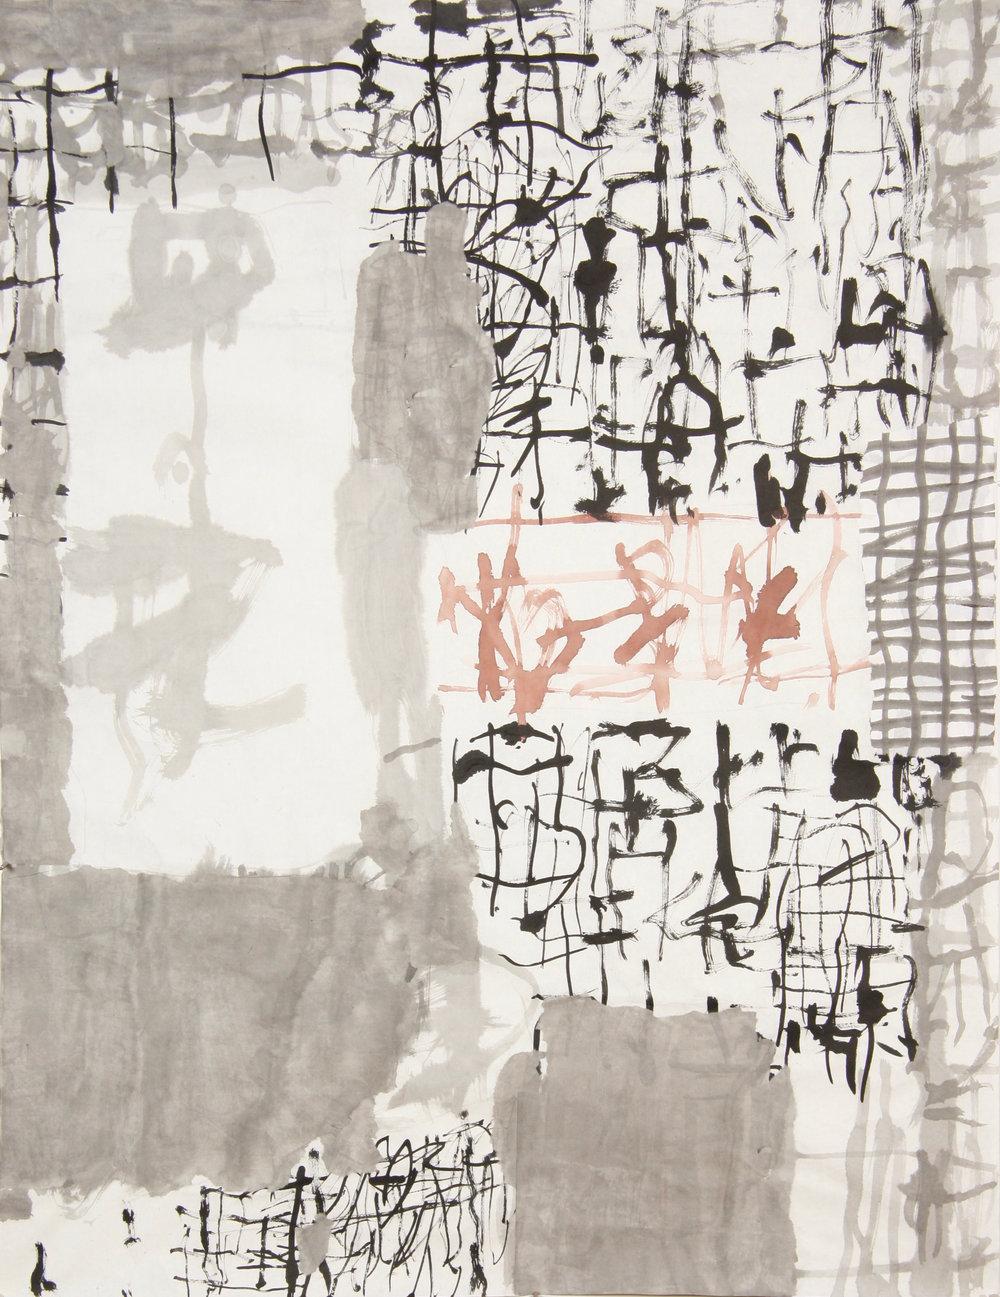 Ana Pollak_15th August_96x75cm_ink on ricepaper_2017.jpg